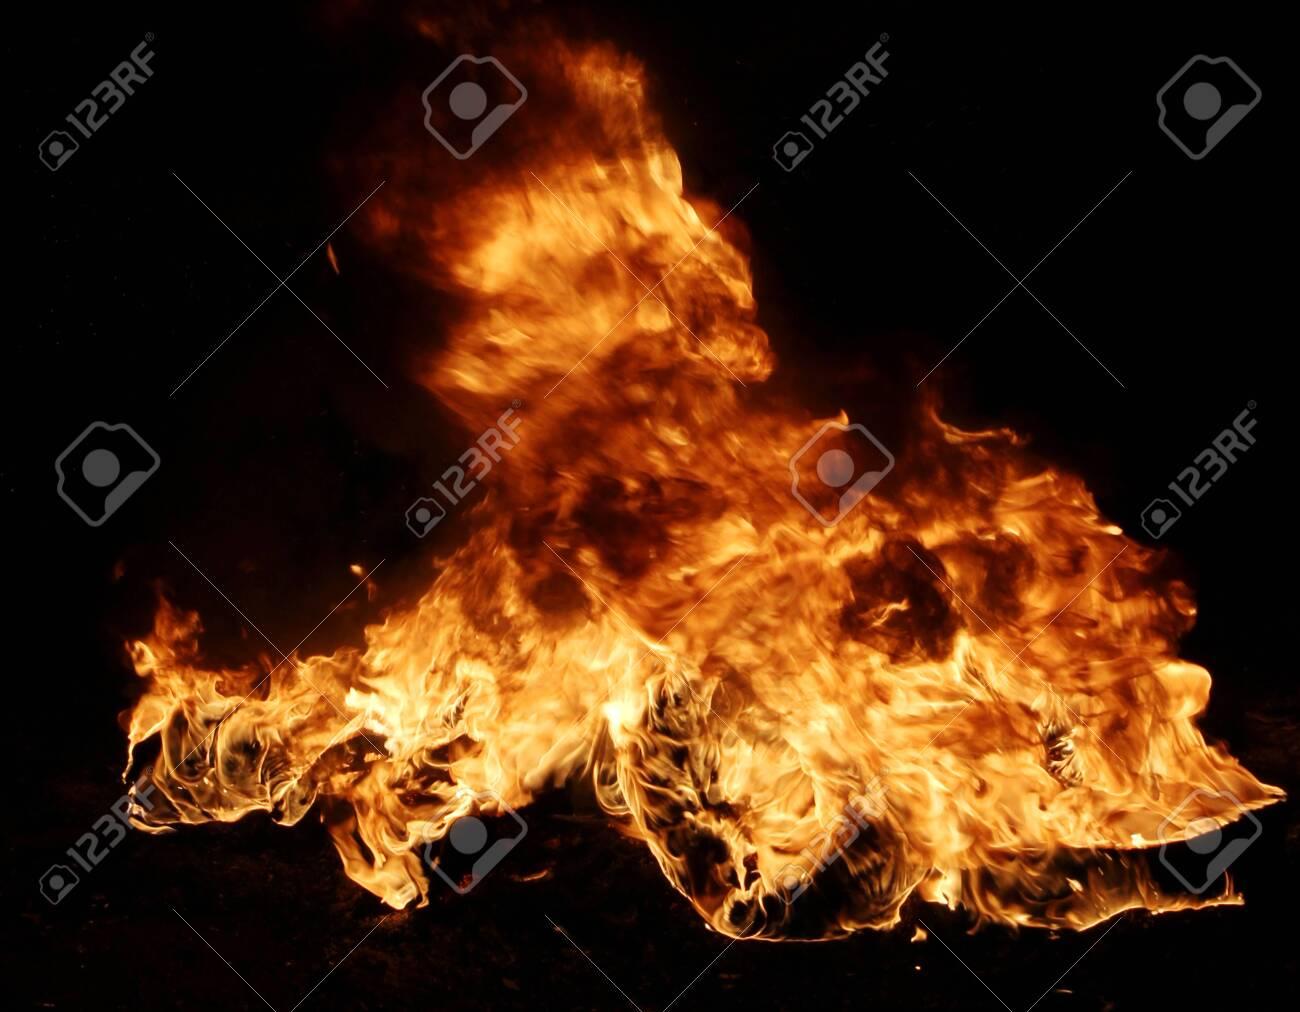 Burning tires creating big black smoke and pollution. - 136728720